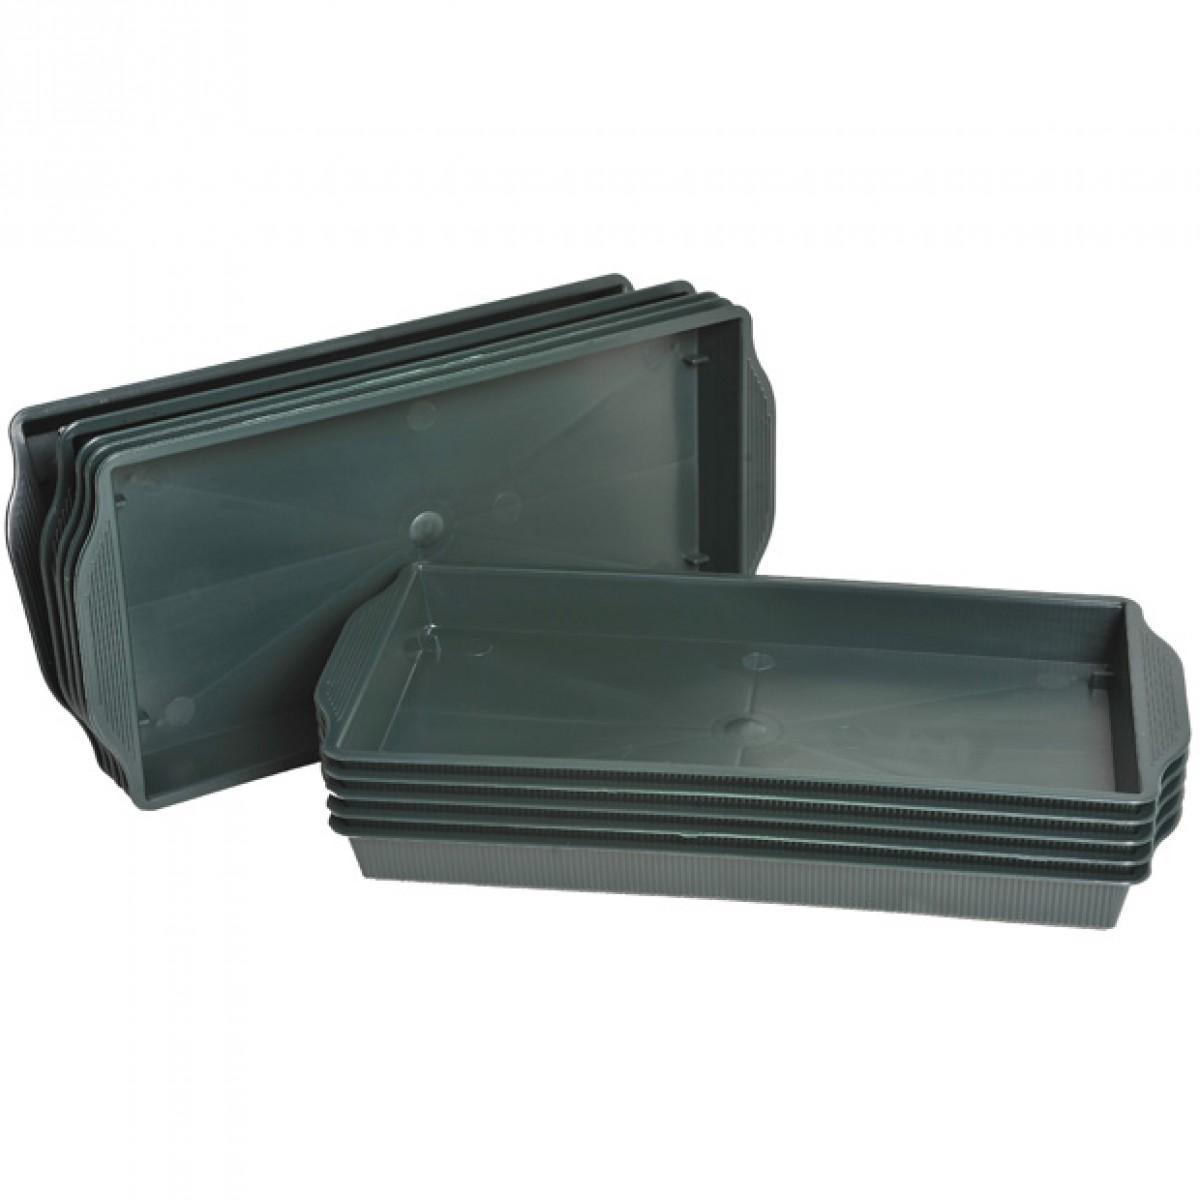 Single Brick Plastic Tray Green - 10 No